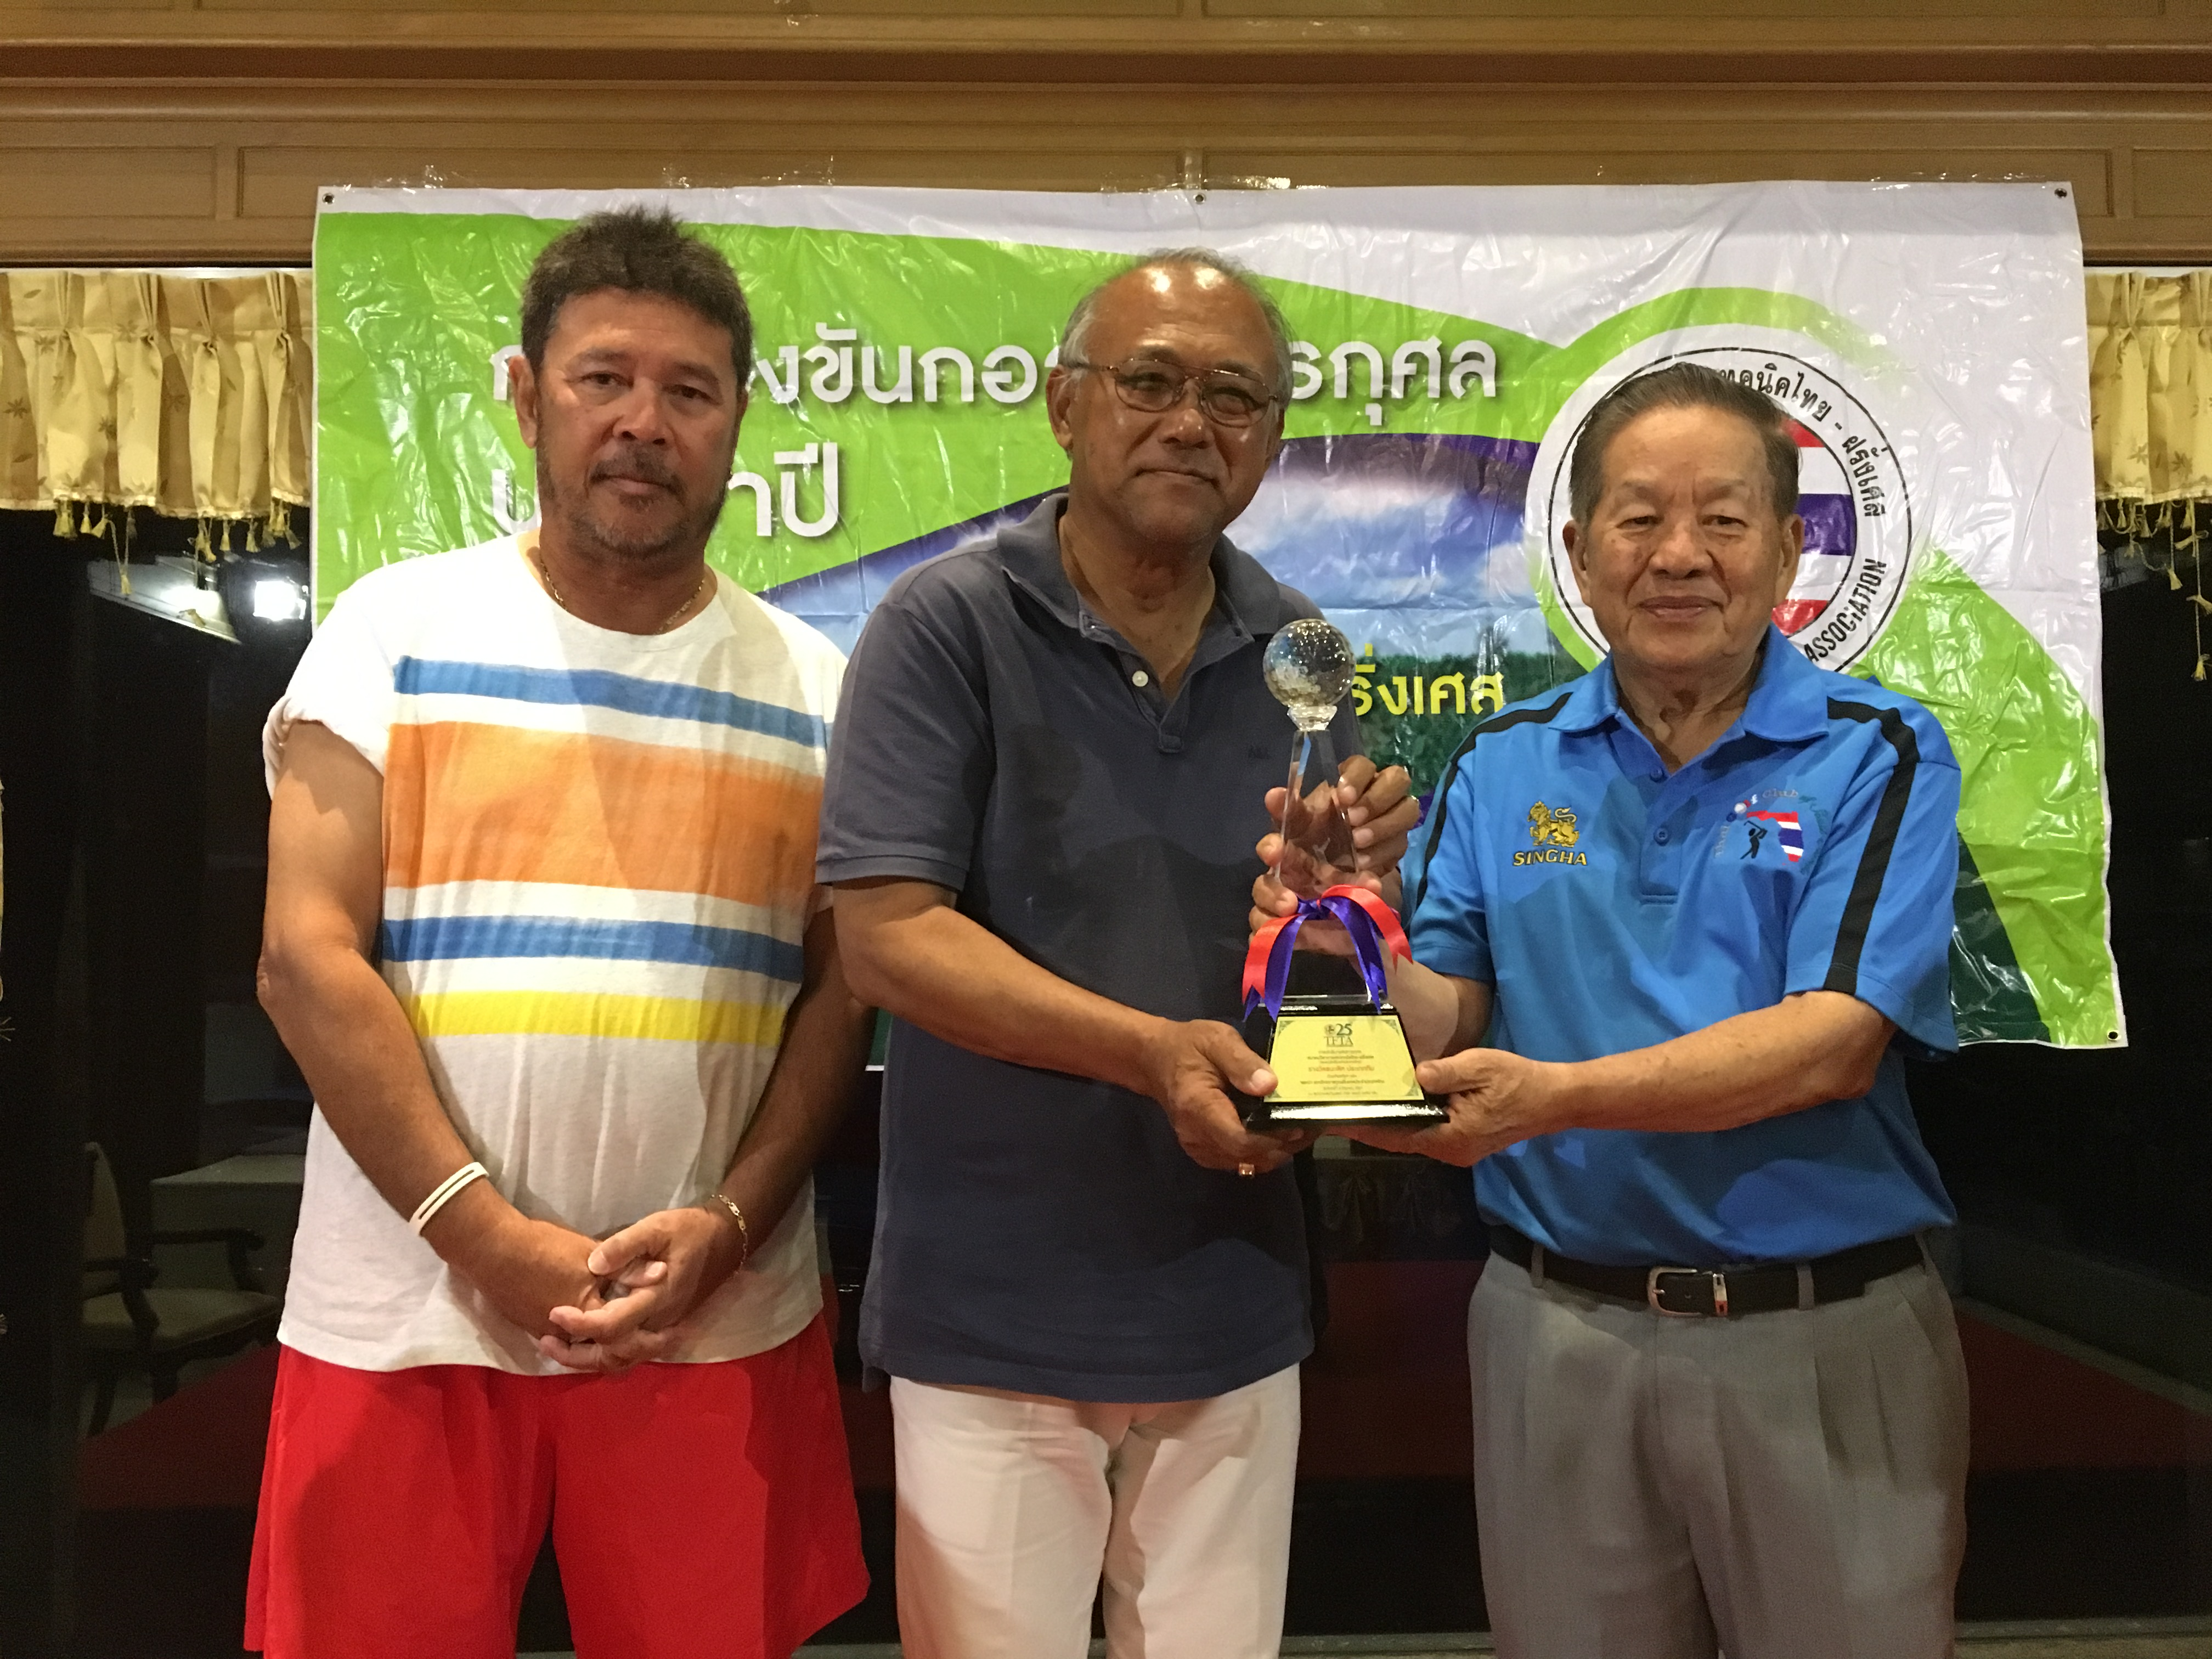 TFTA's Charity Golf Tournament in 2018